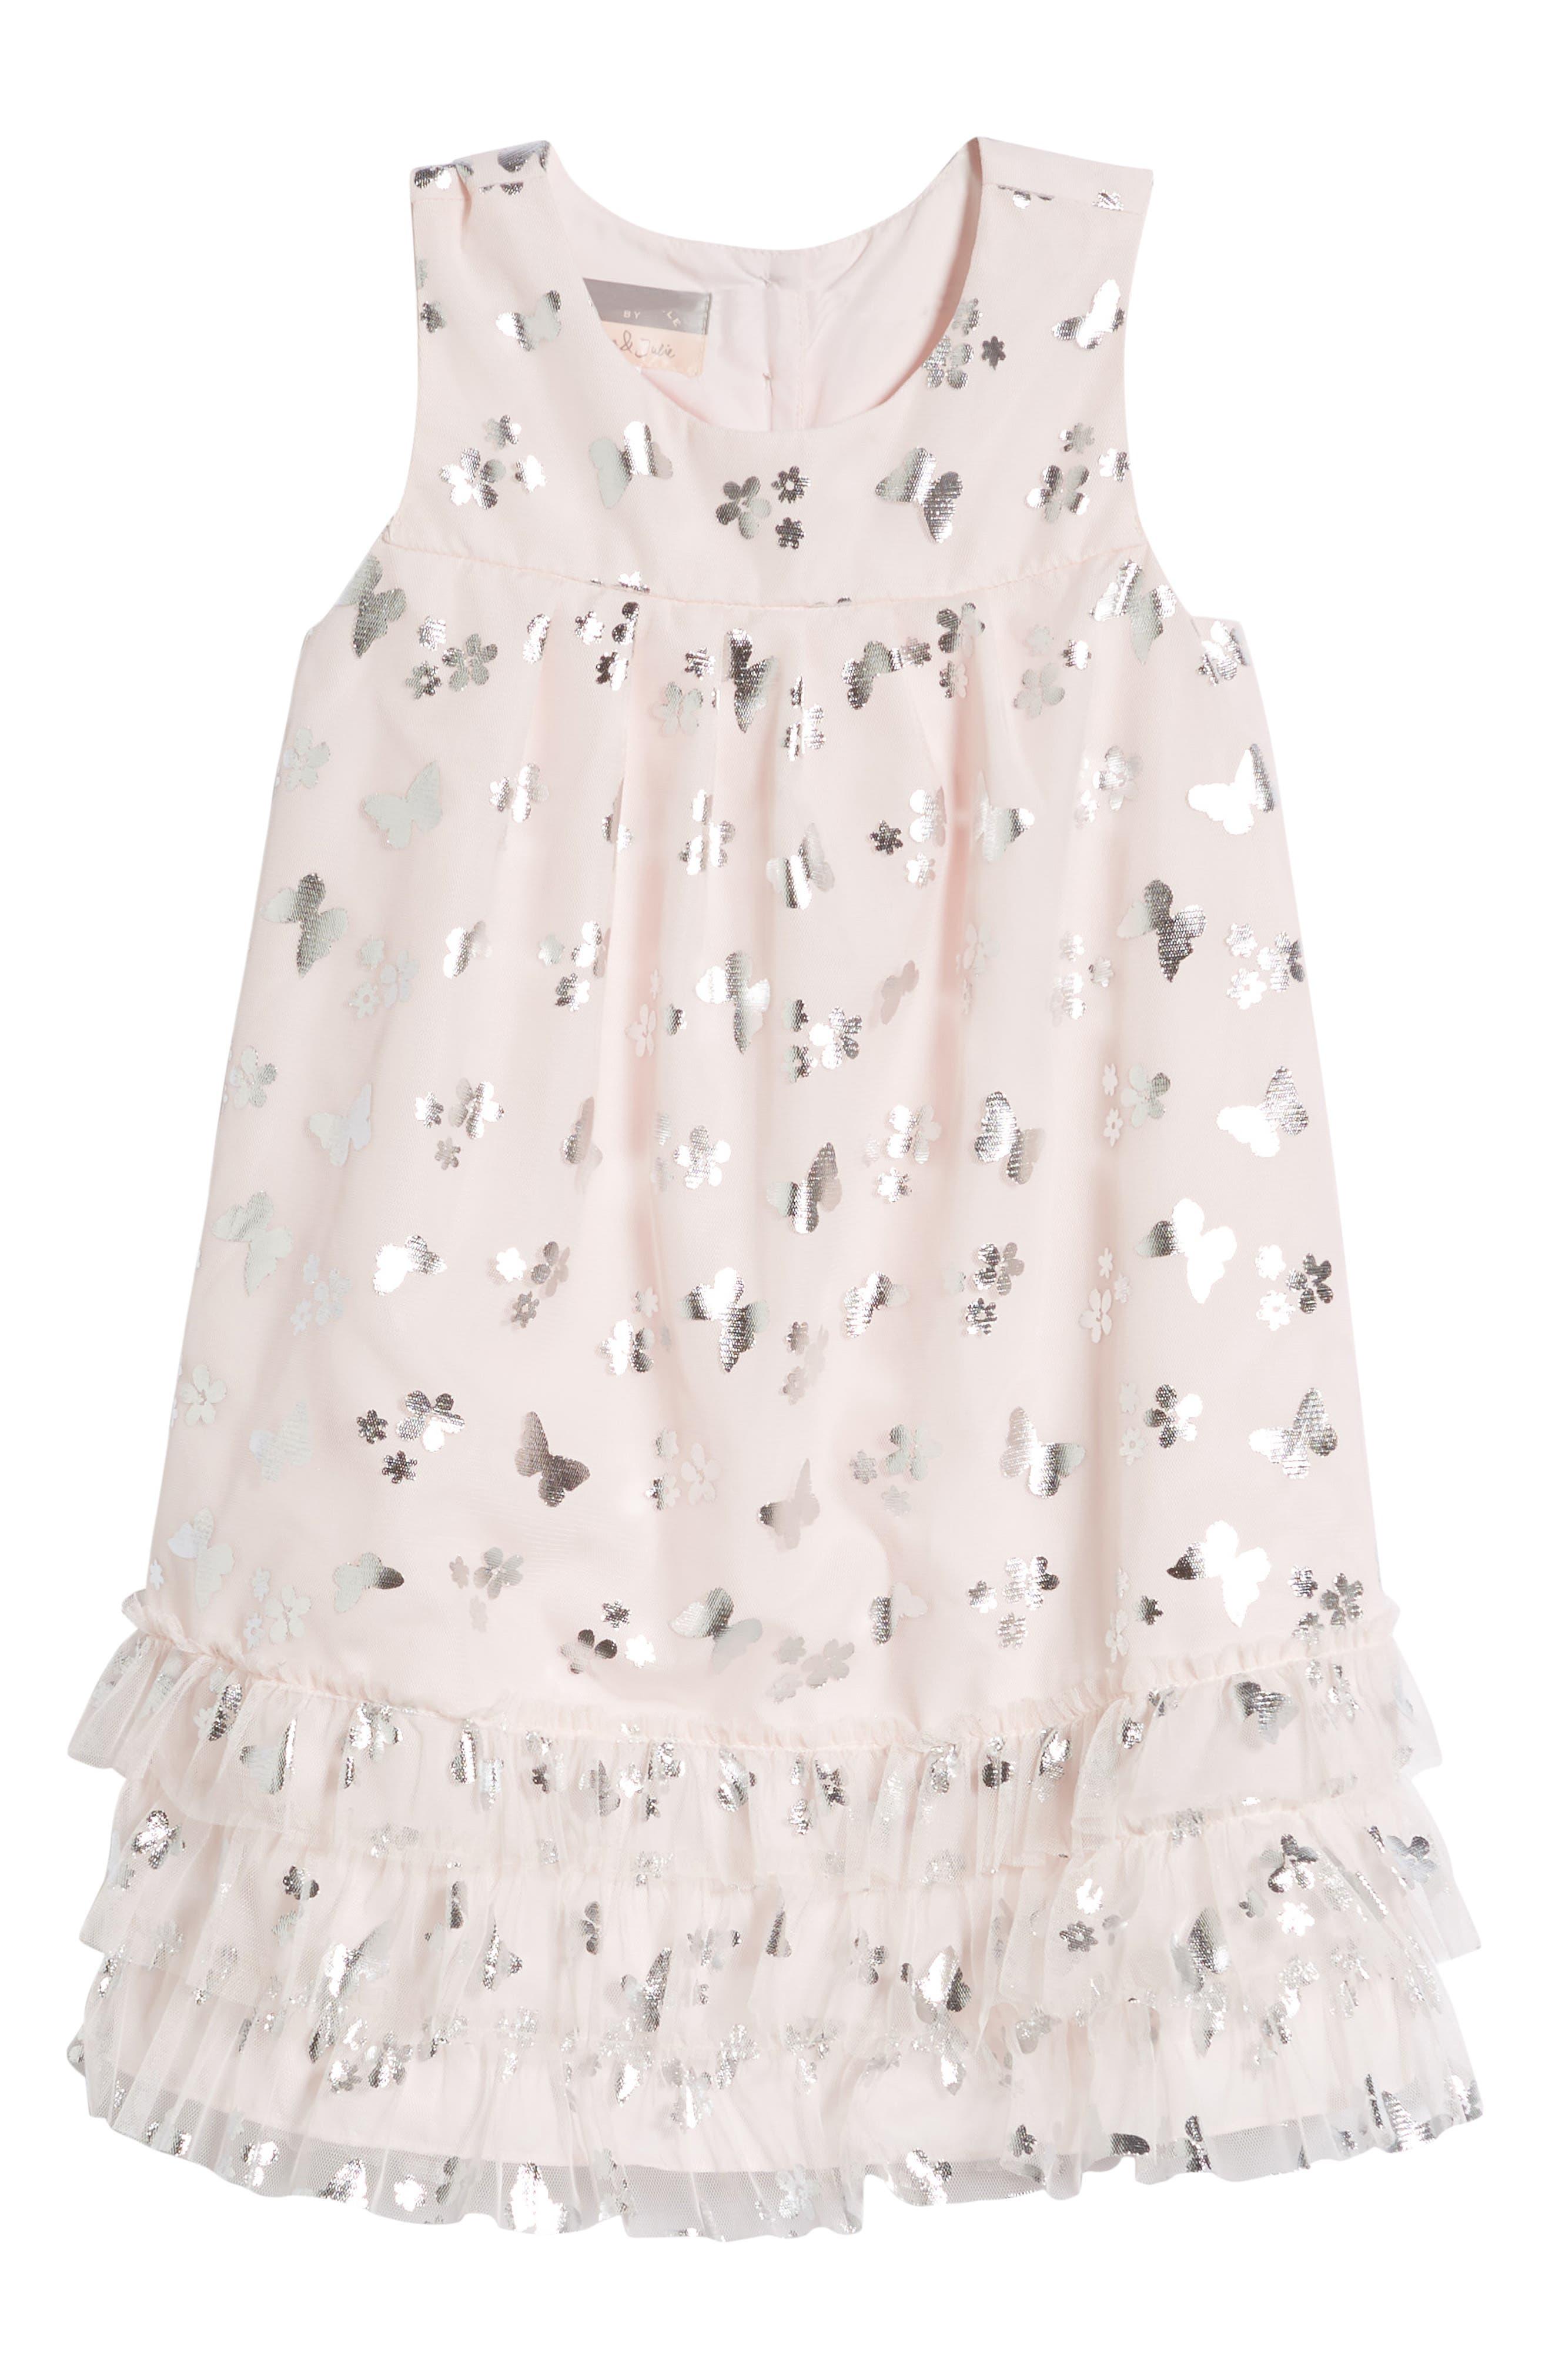 2c9e46509fff Girl's Pastourelle By Pippa & Julie Butterfly Trapeze Dress